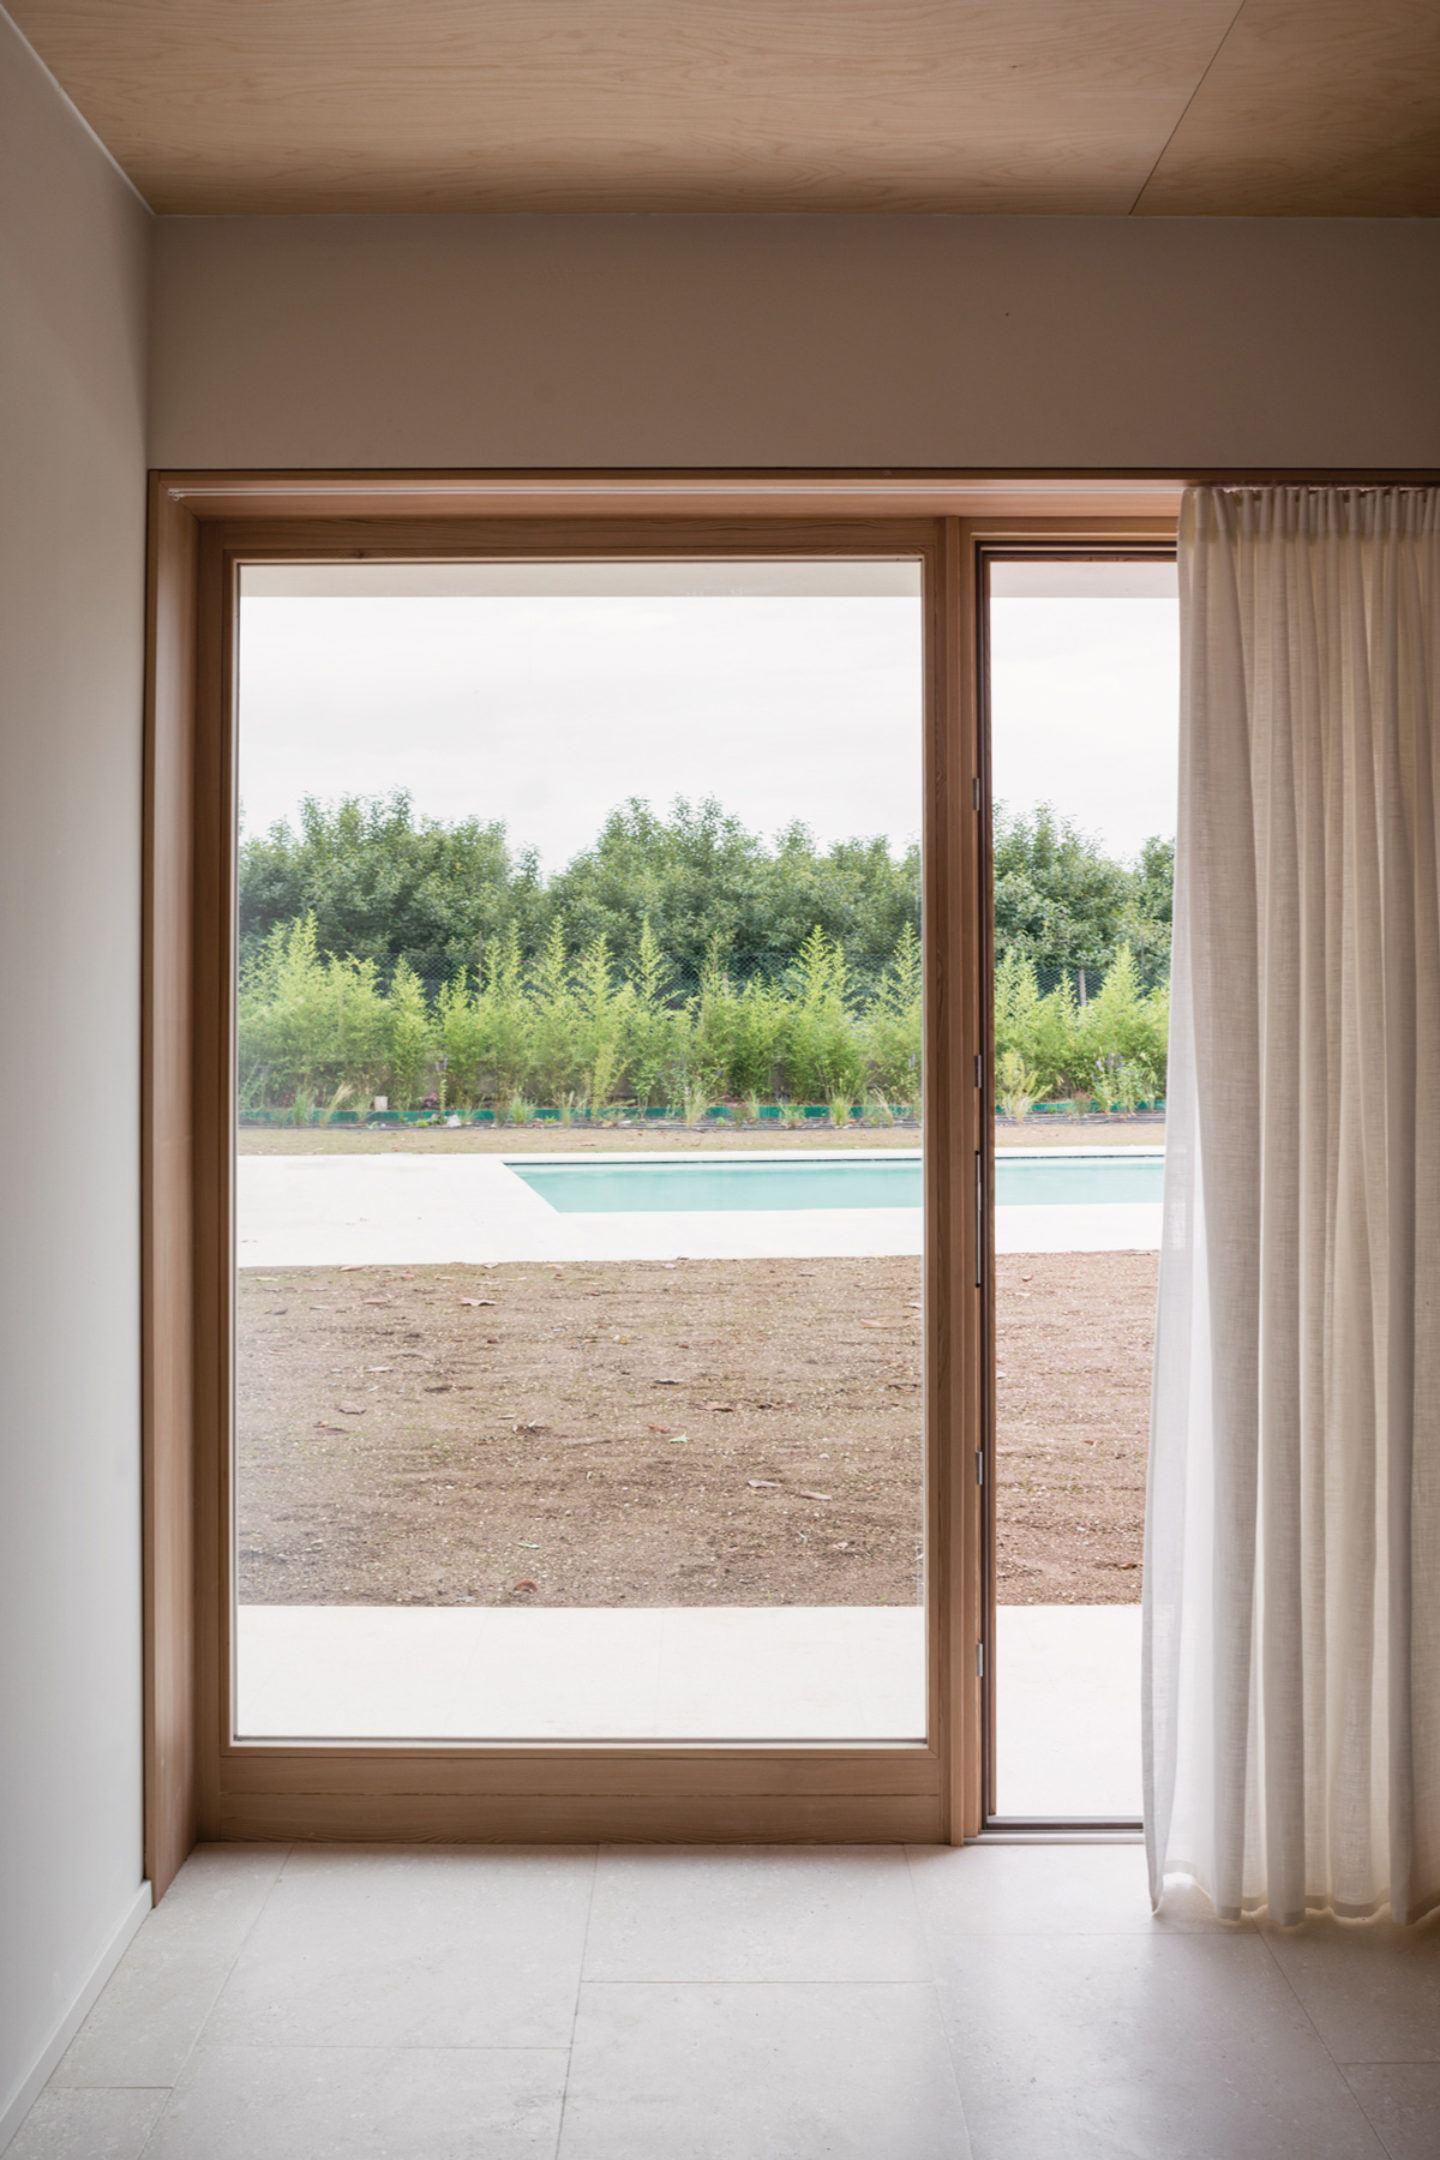 IGNANT-Architecture-Studio-Wok-Country-Home-In-Chievo-16